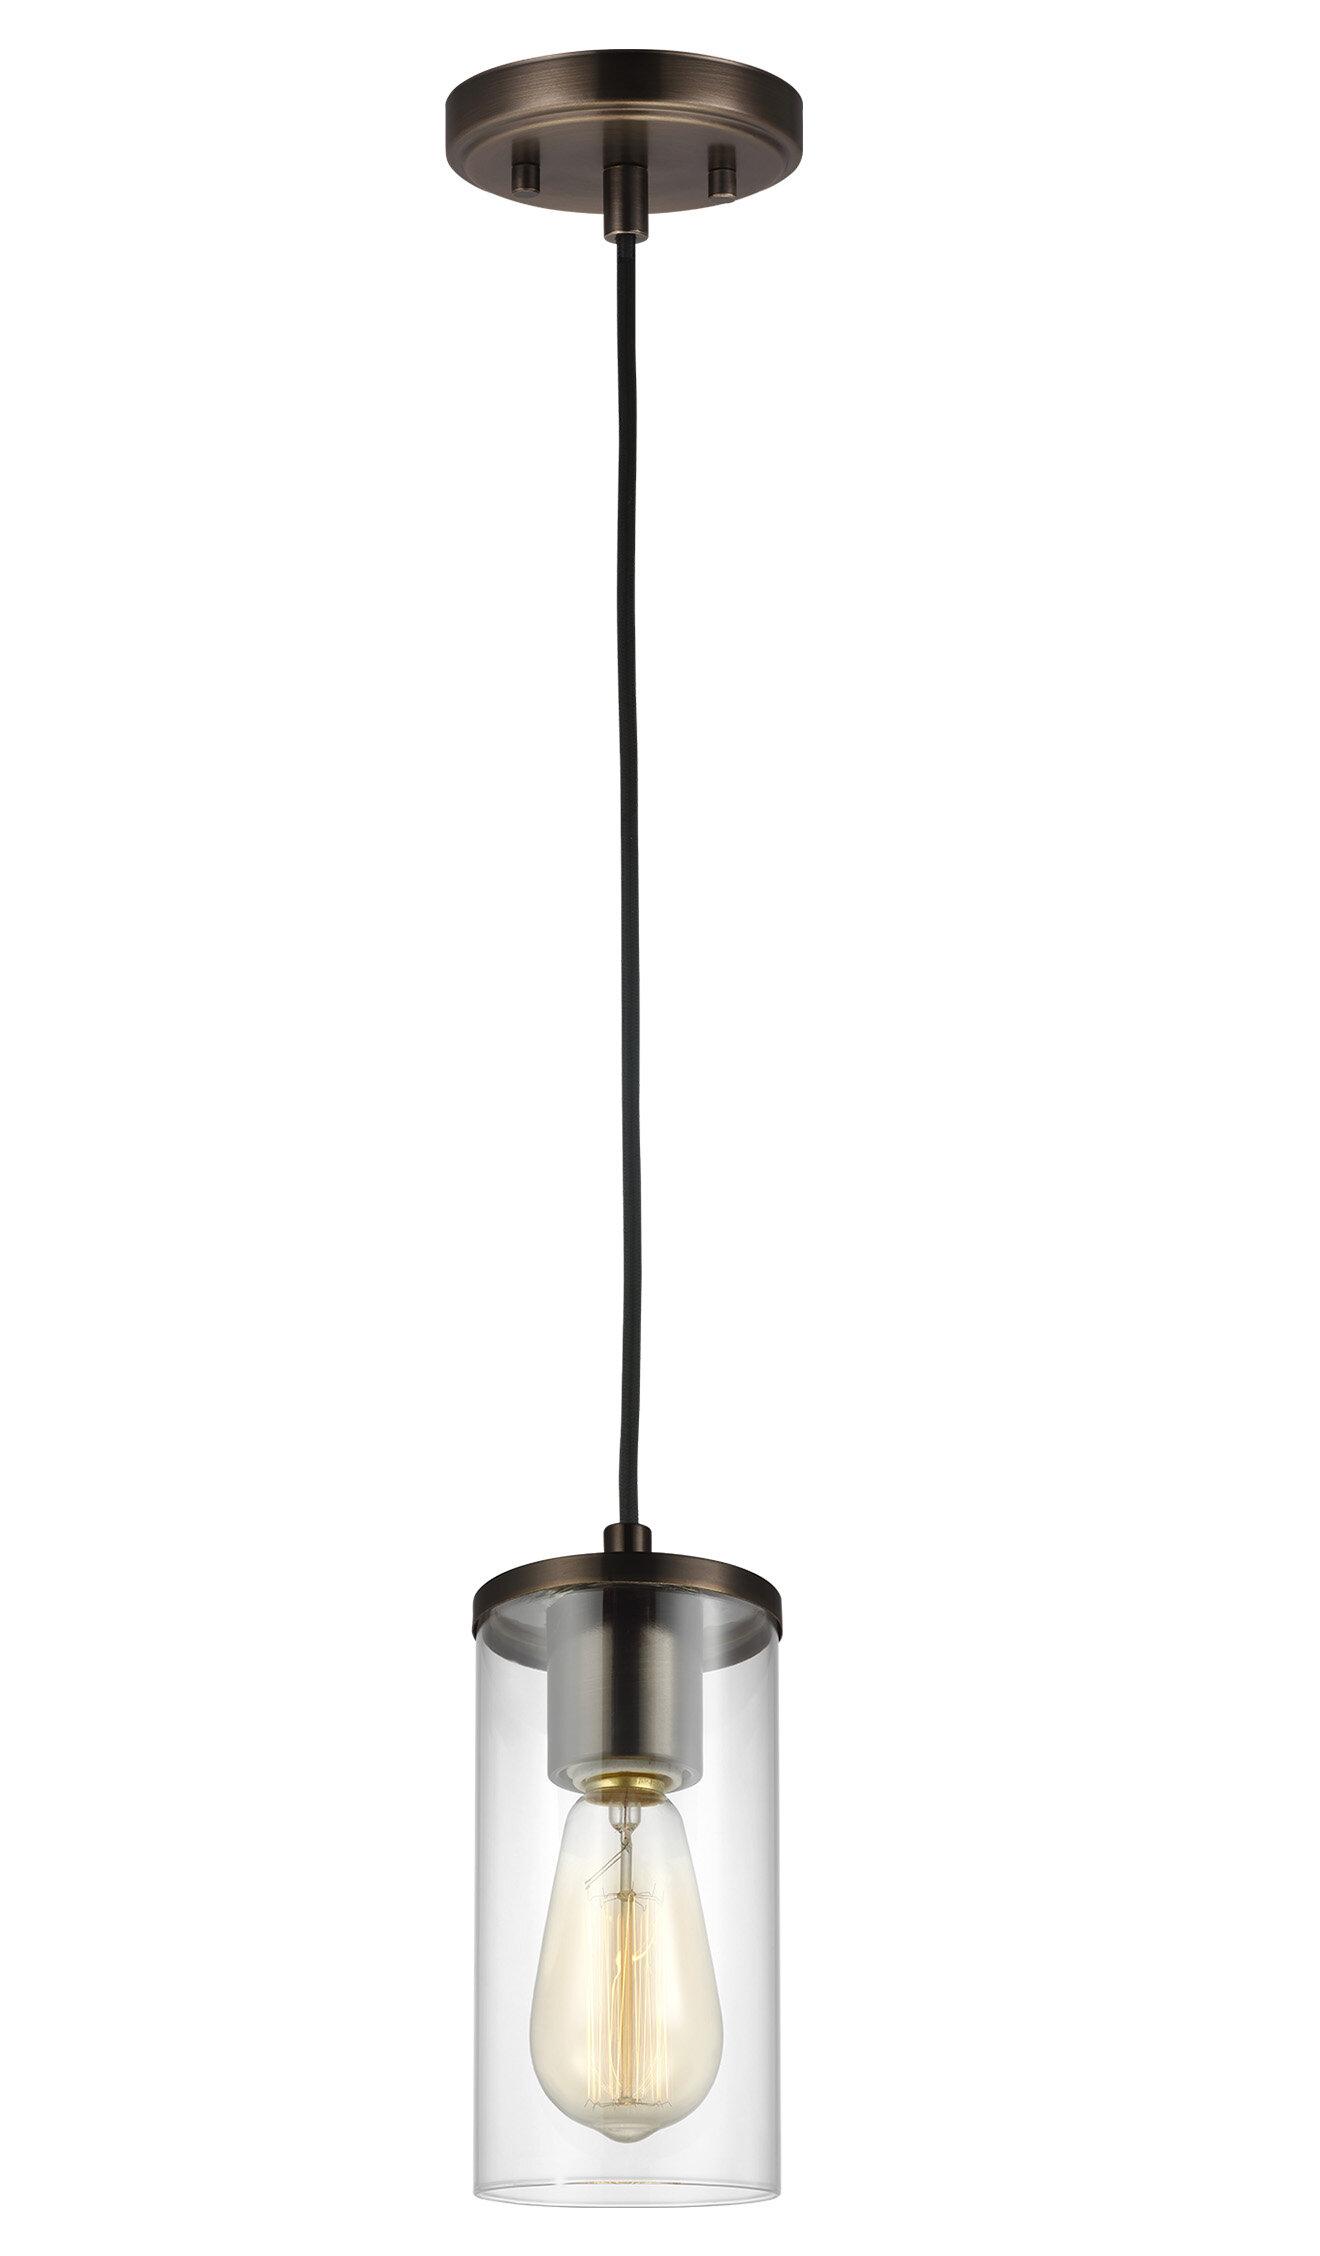 Orren Ellis Tallapoosa 1 Light Single Cylinder Pendant Reviews Wayfair